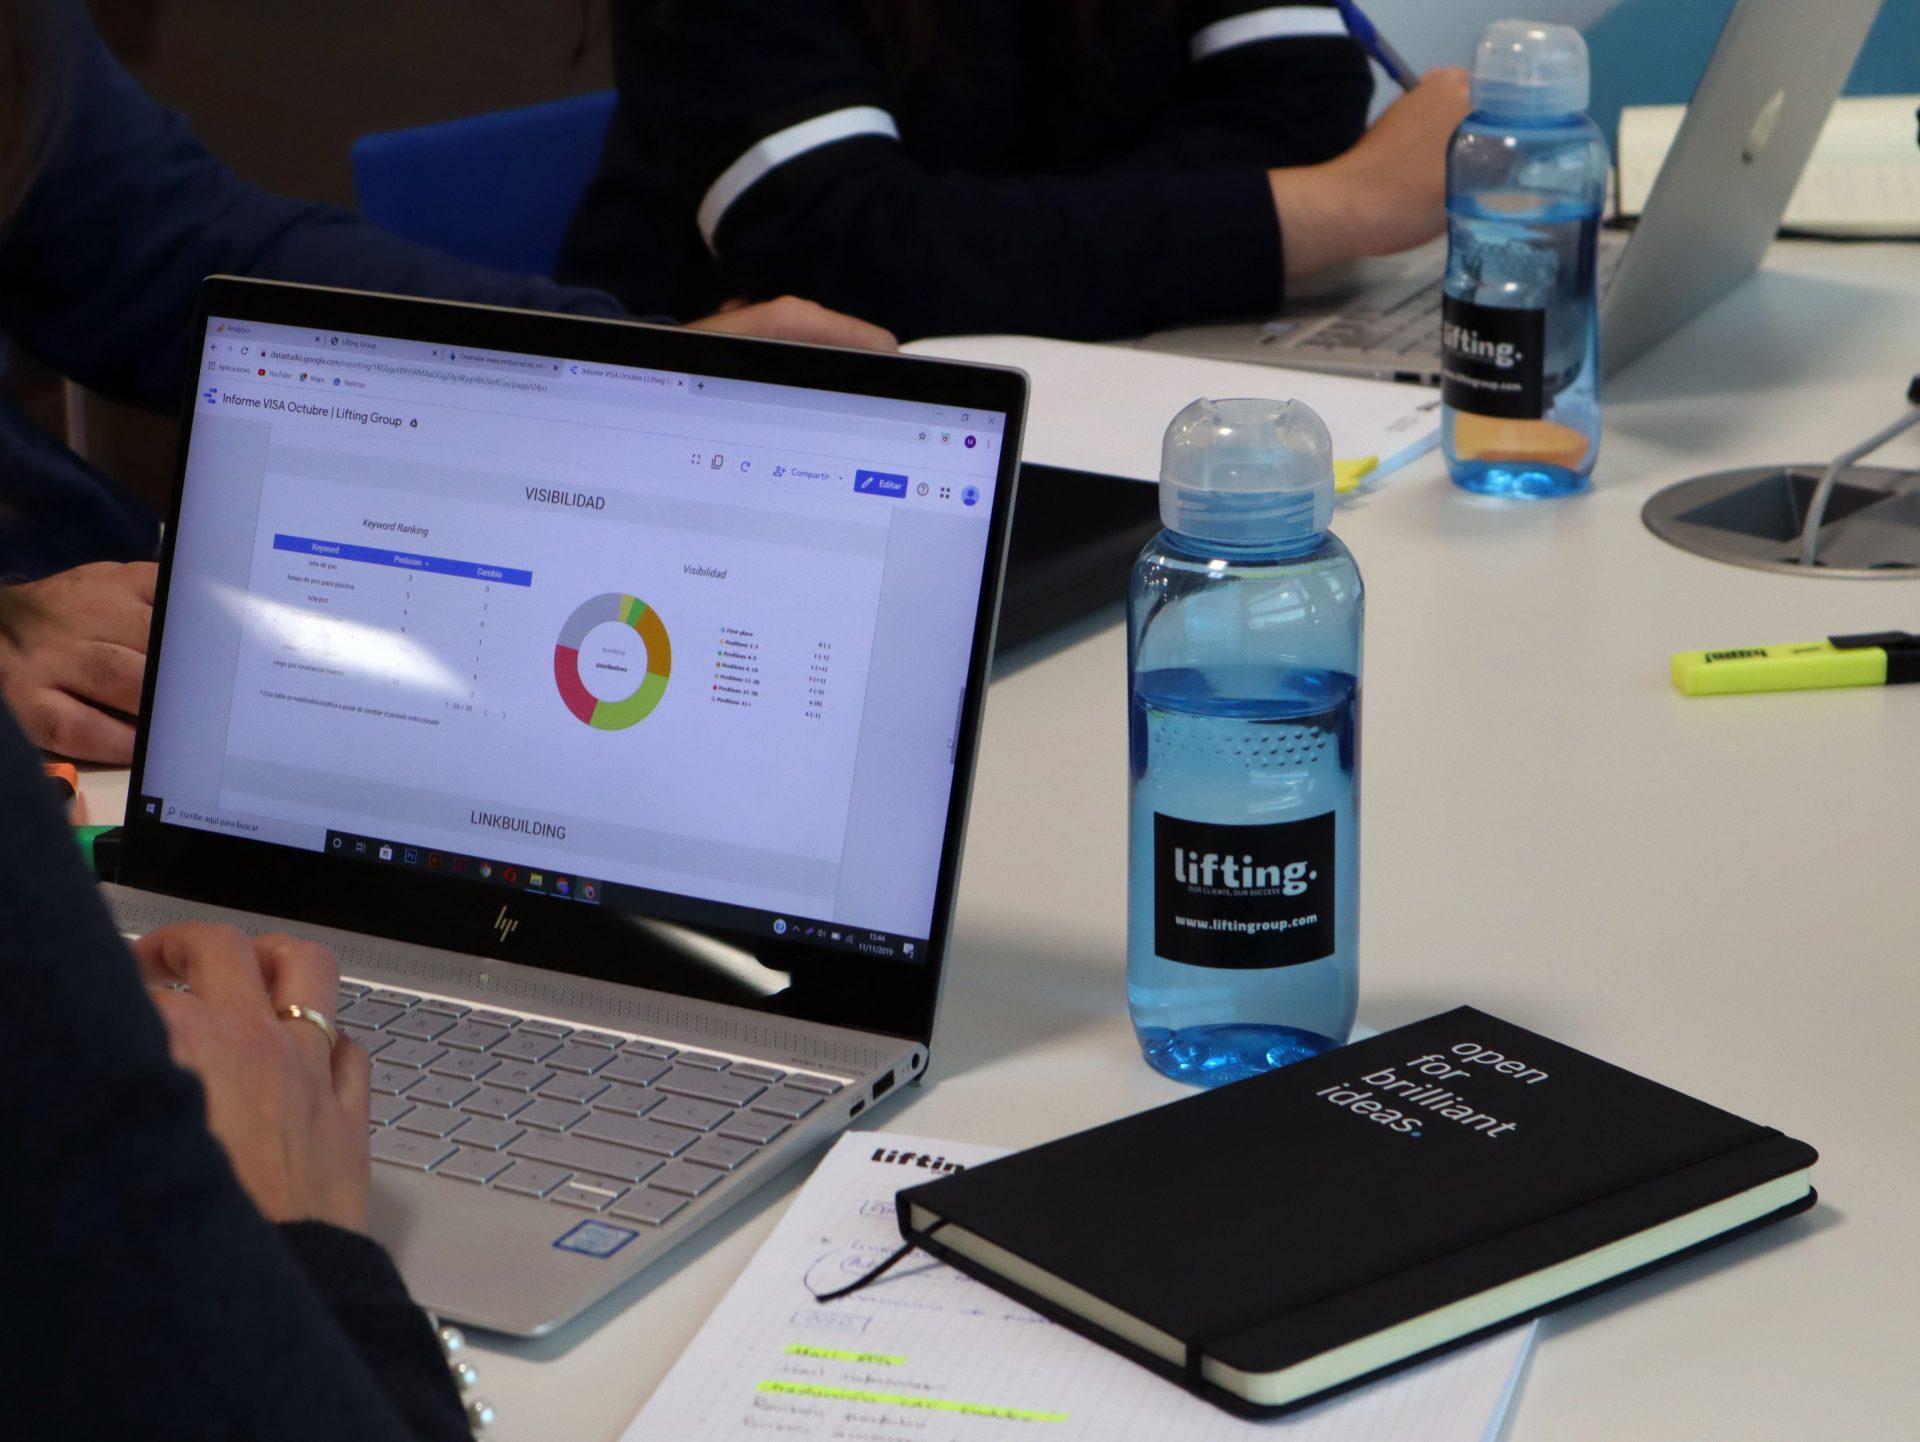 Agencia UX - User Experience